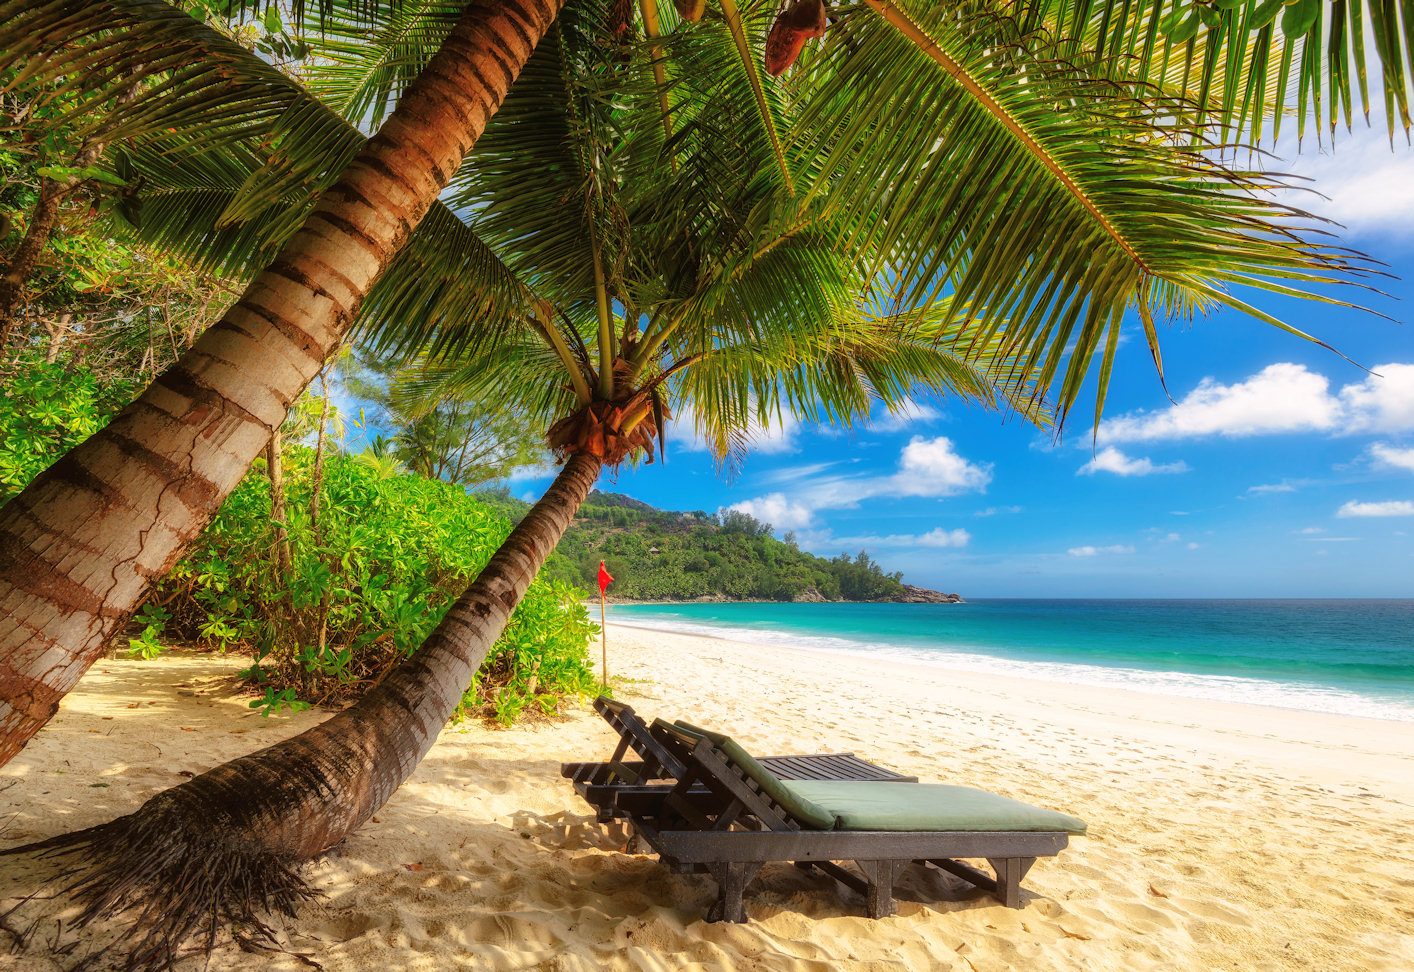 Anse Takamaka Beach, Mahe Island, Seychelles бесплатно